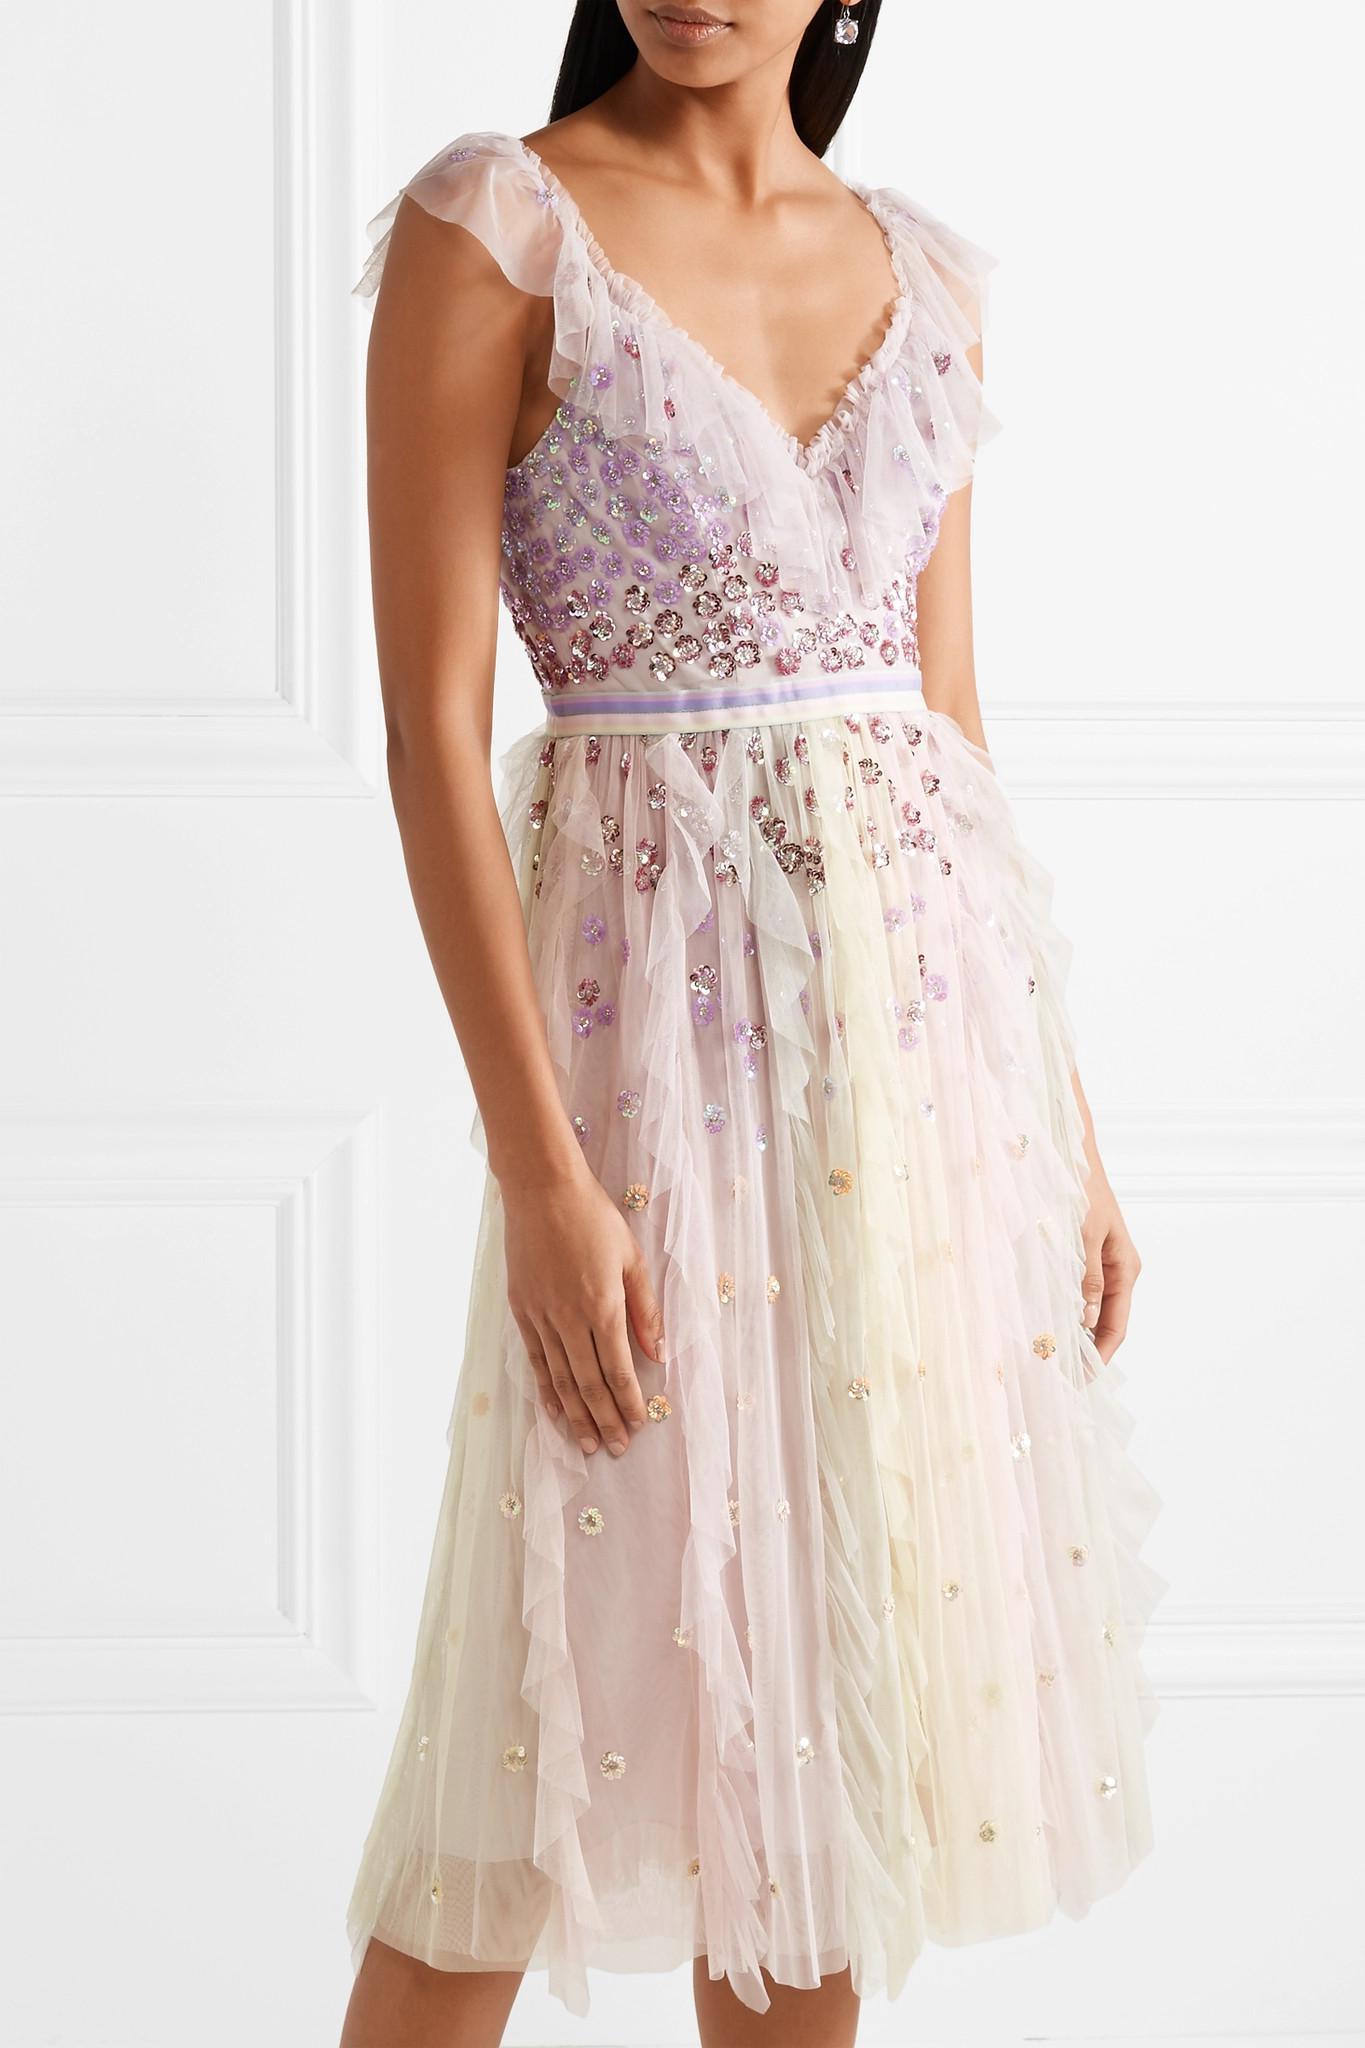 088b403b19 Needle & Thread Rainbow Embellished Ruffled Tulle Midi Dress in Pink ...